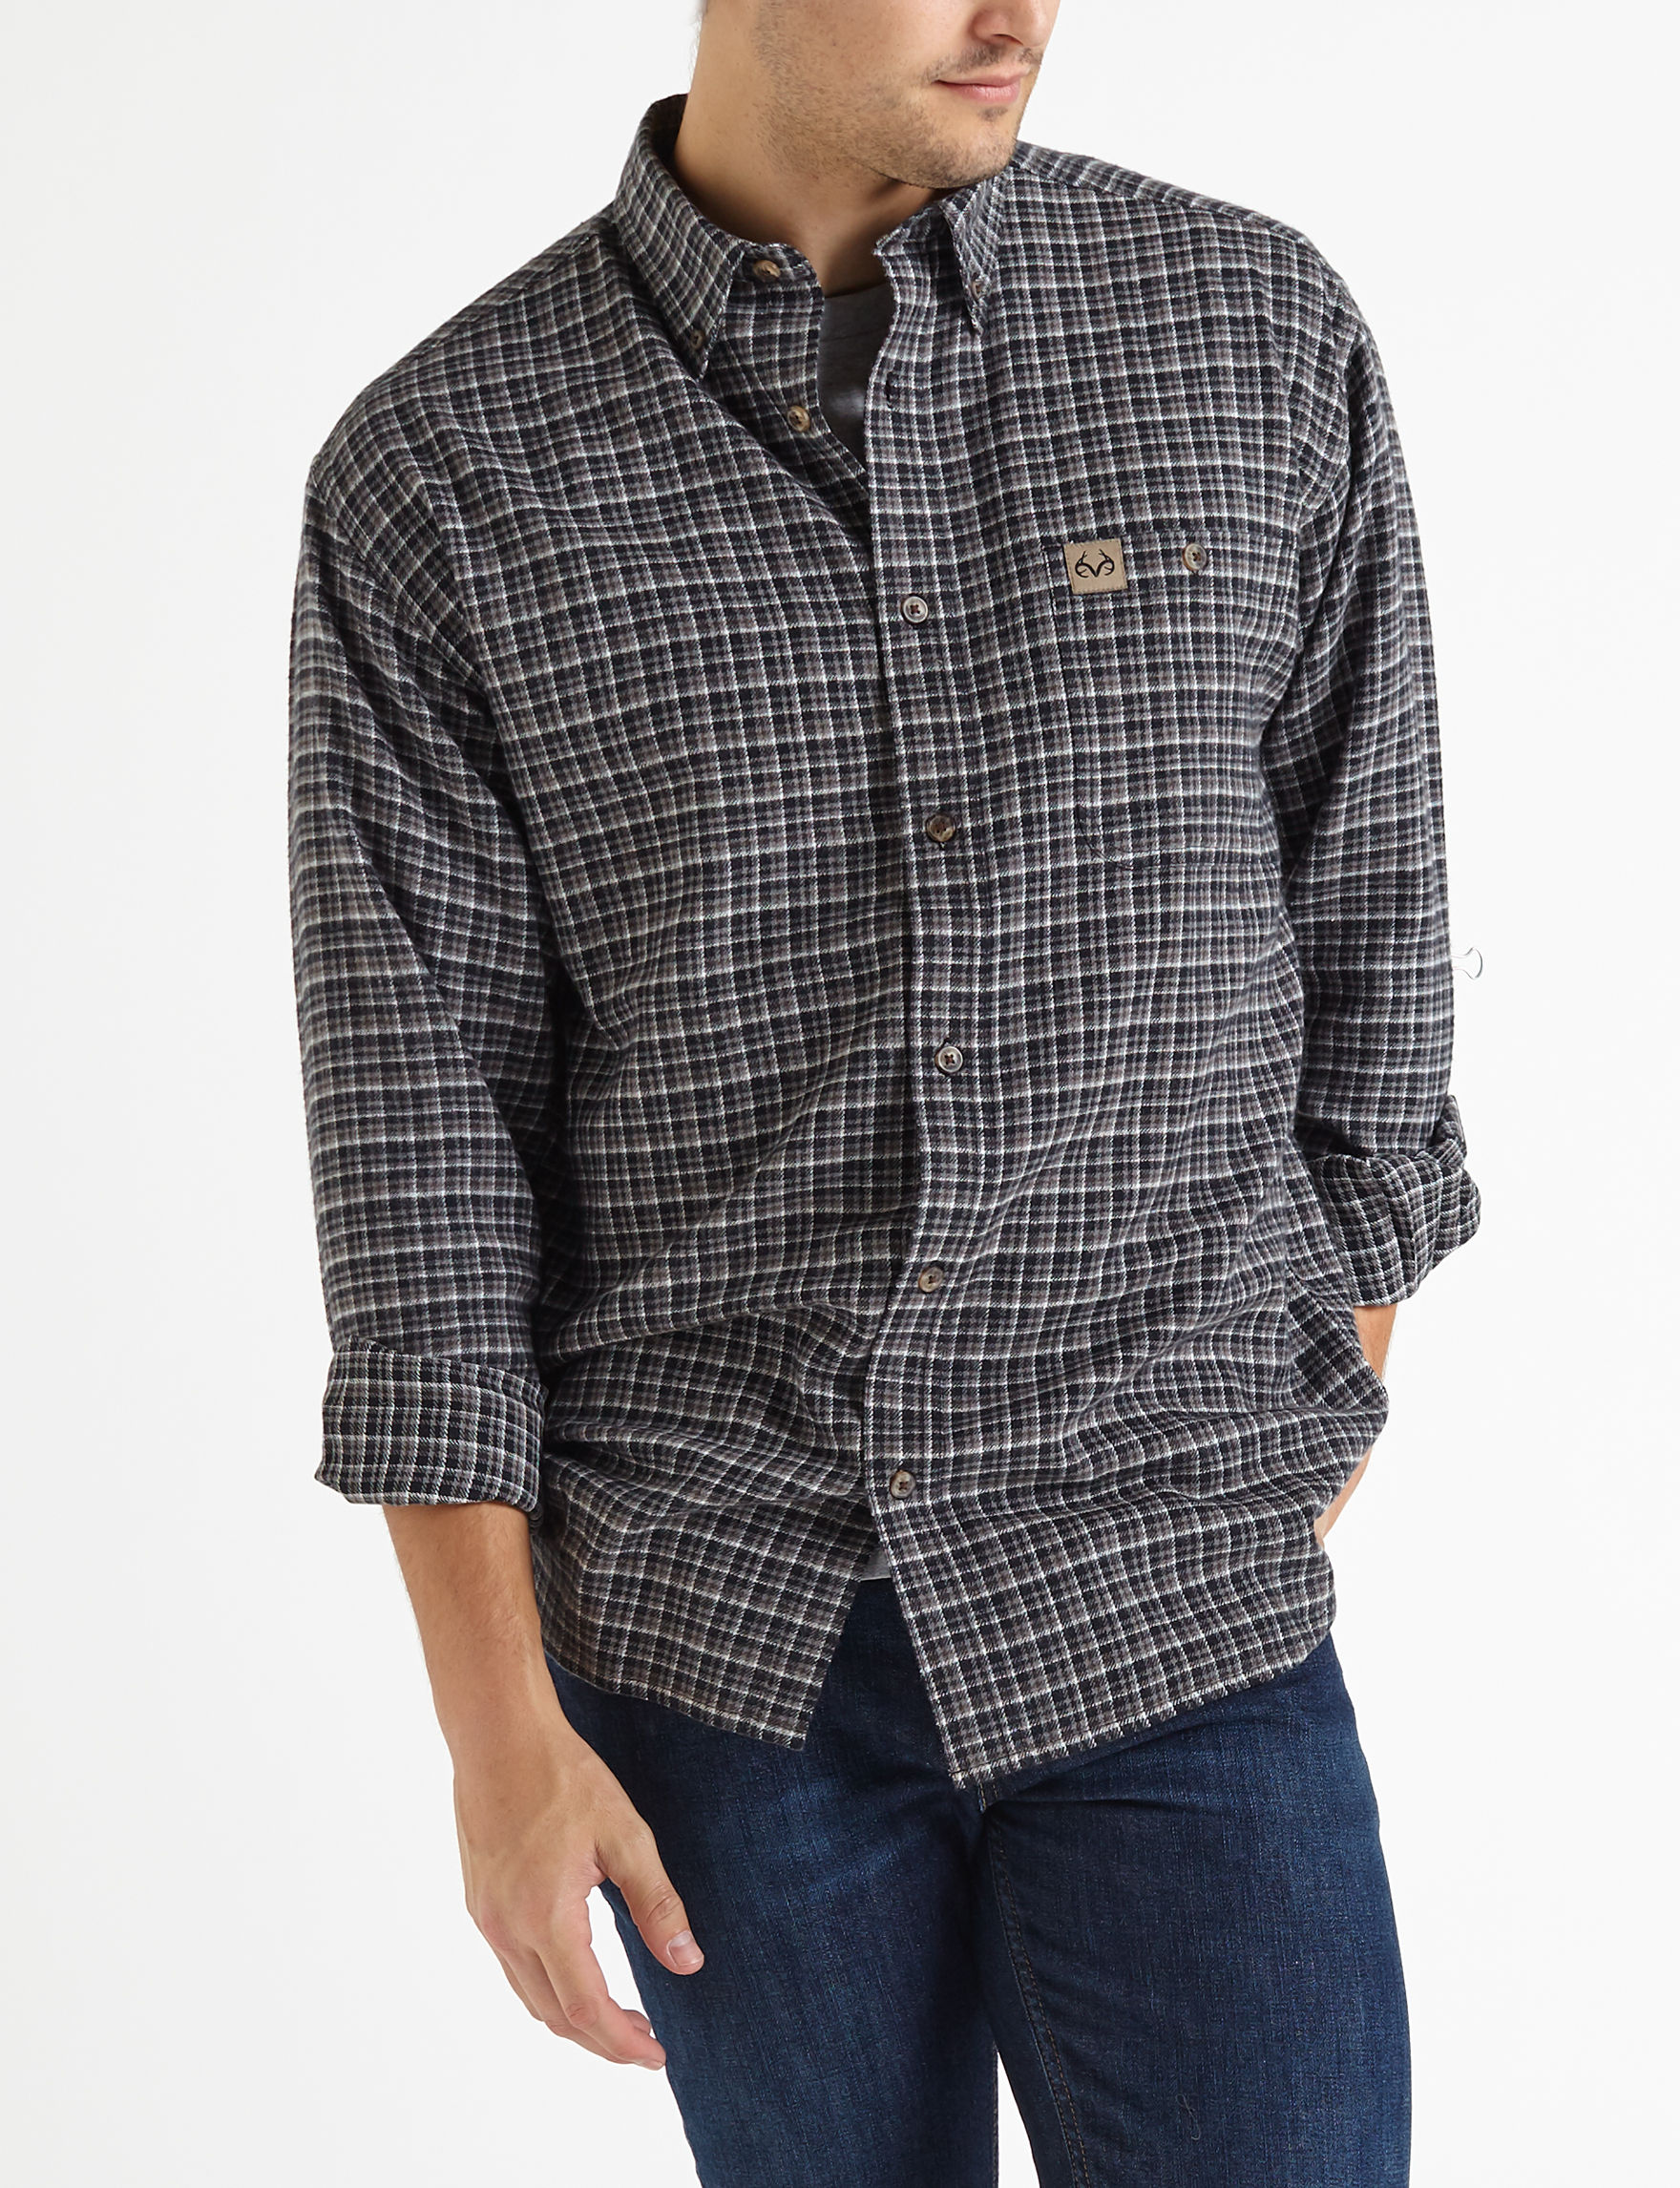 Realtree Black / Multi Casual Button Down Shirts